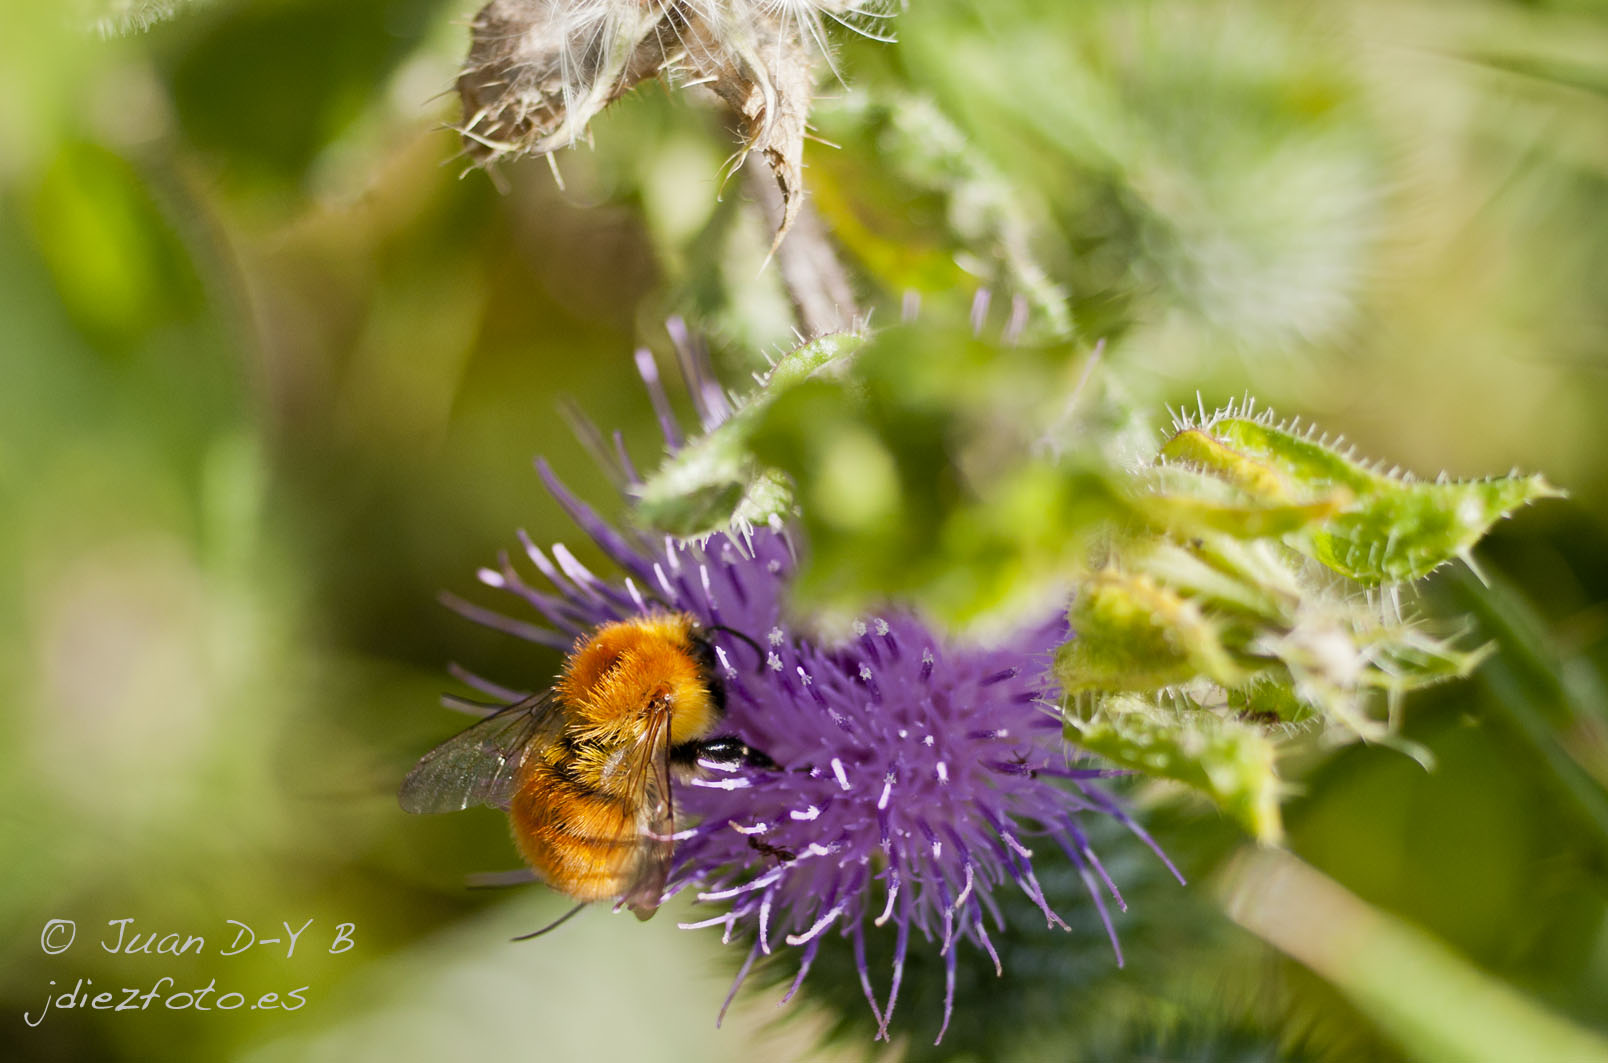 Cardos Blancos con abeja